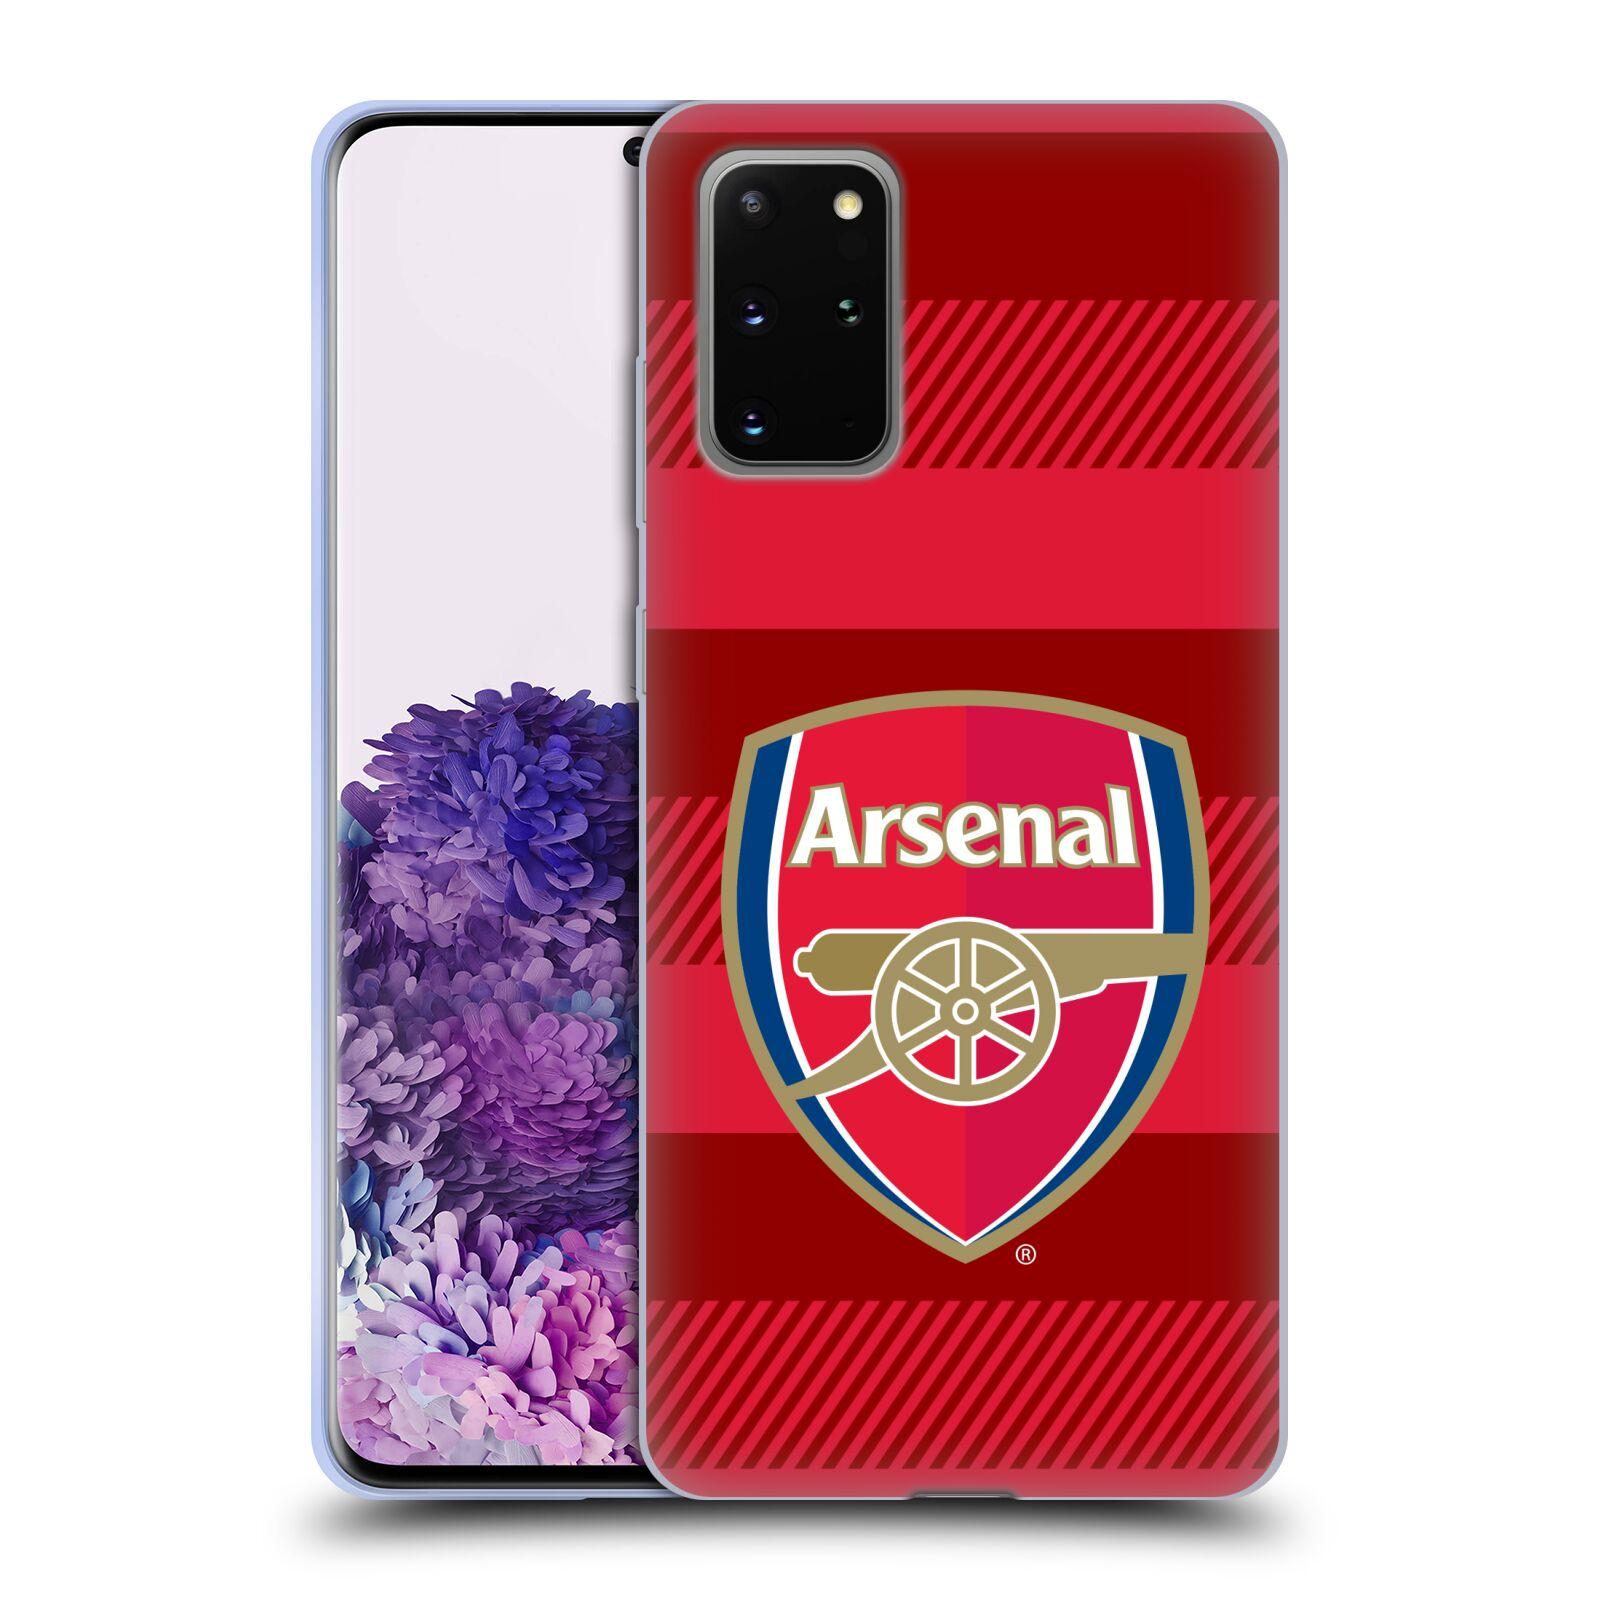 Silikonové pouzdro na mobil Samsung Galaxy S20 Plus - Head Case - Arsenal FC - Logo s pruhy